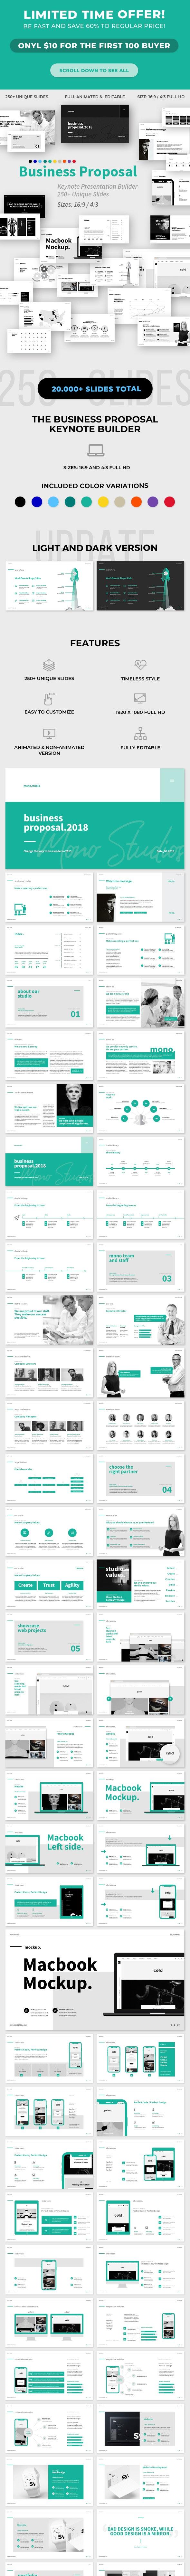 Business Proposal Keynote Template - Business Keynote Templates